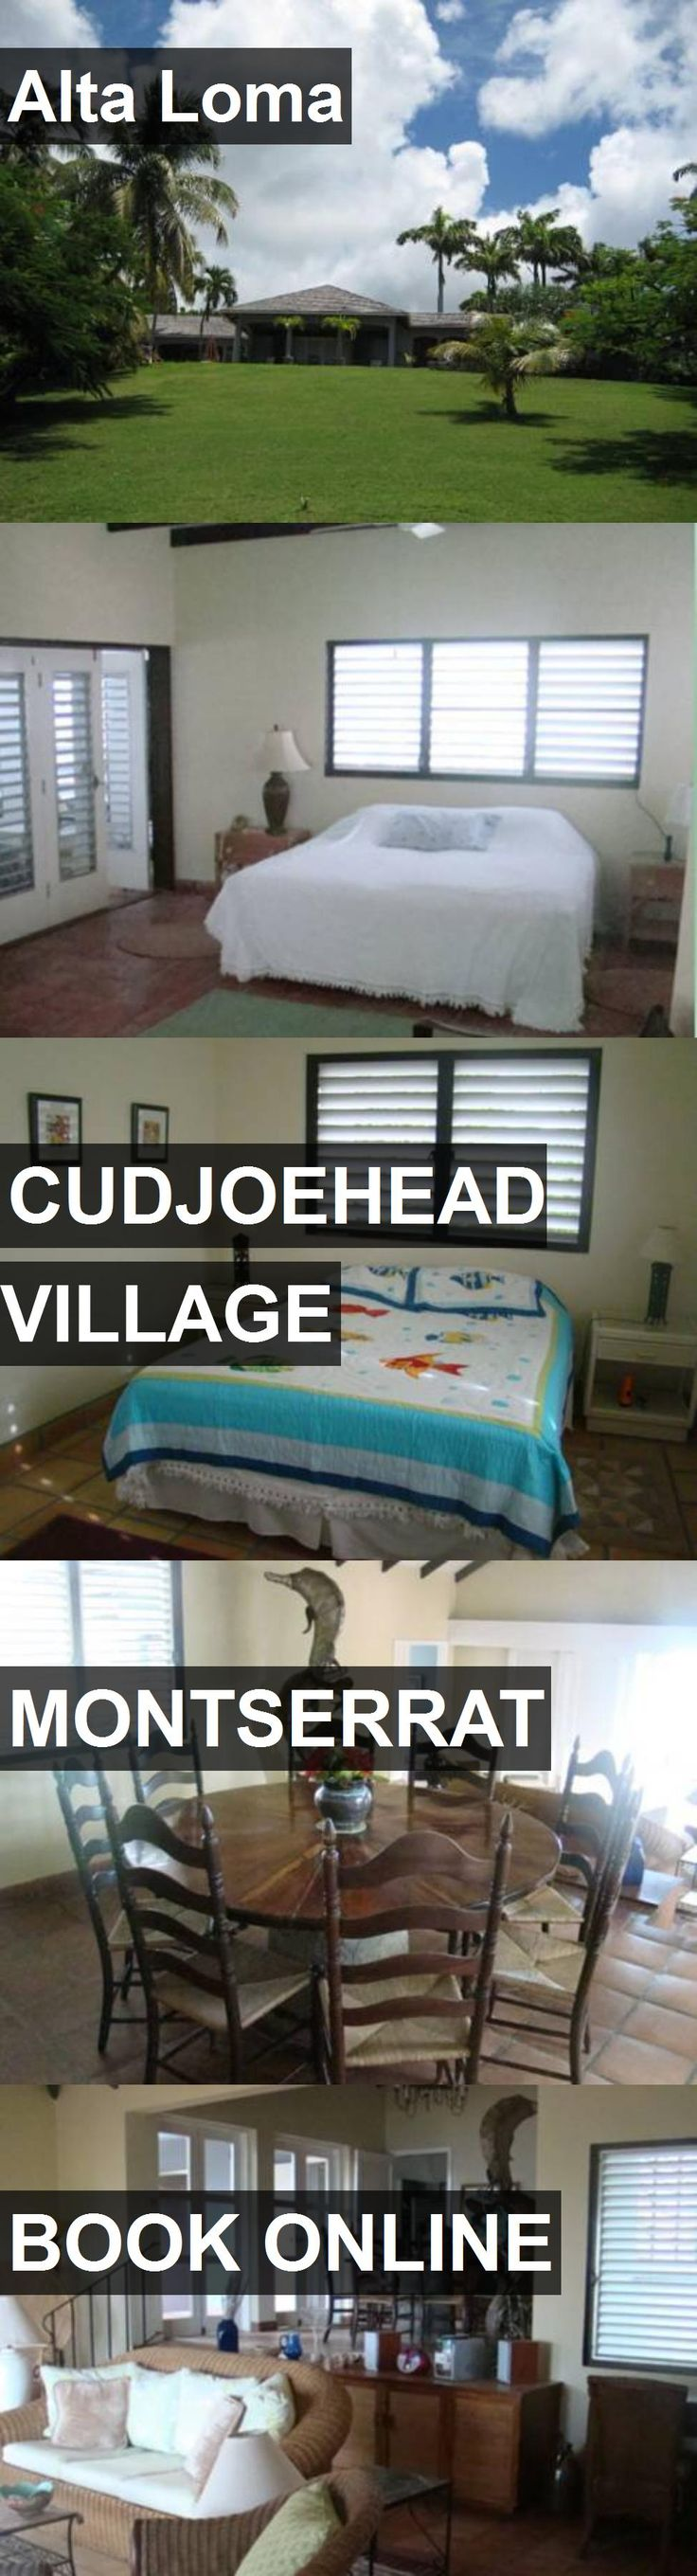 Hotel Alta Loma in Cudjoehead Village, Montserrat. For more information, photos, reviews and best prices please follow the link. #Montserrat #CudjoeheadVillage #travel #vacation #hotel